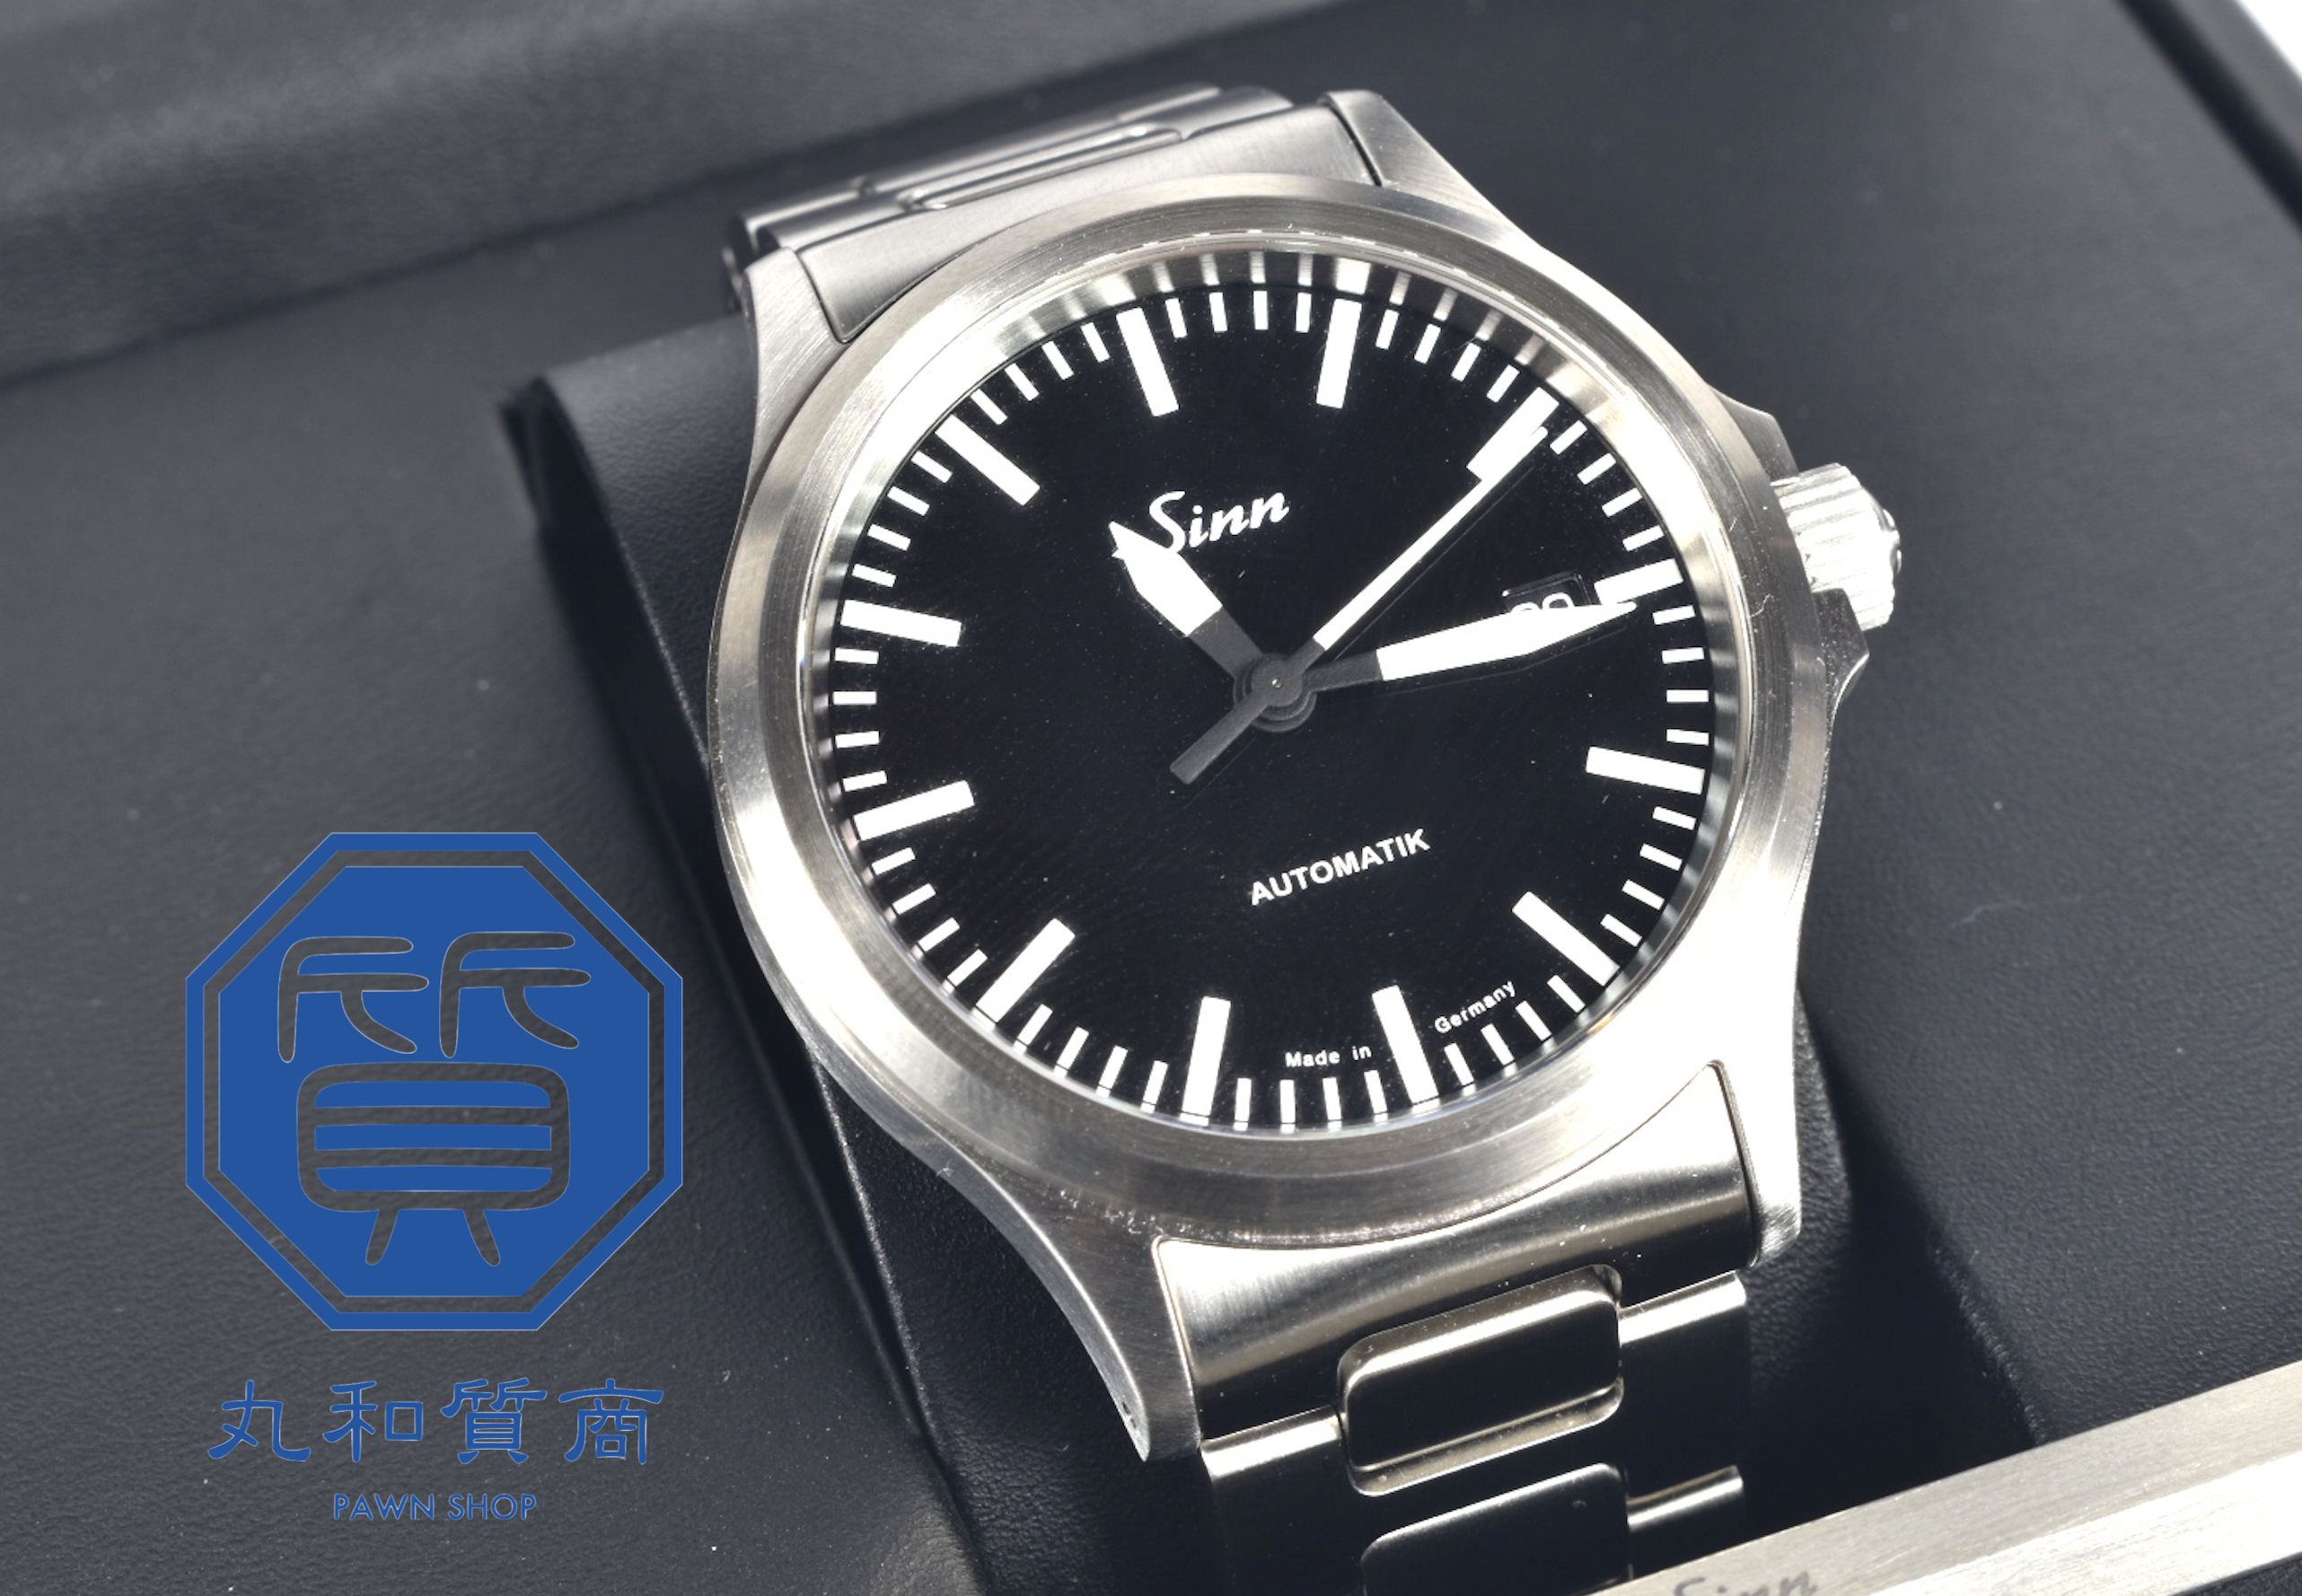 SINN(ジン) 556.M 腕時計をお買取させていただきました。